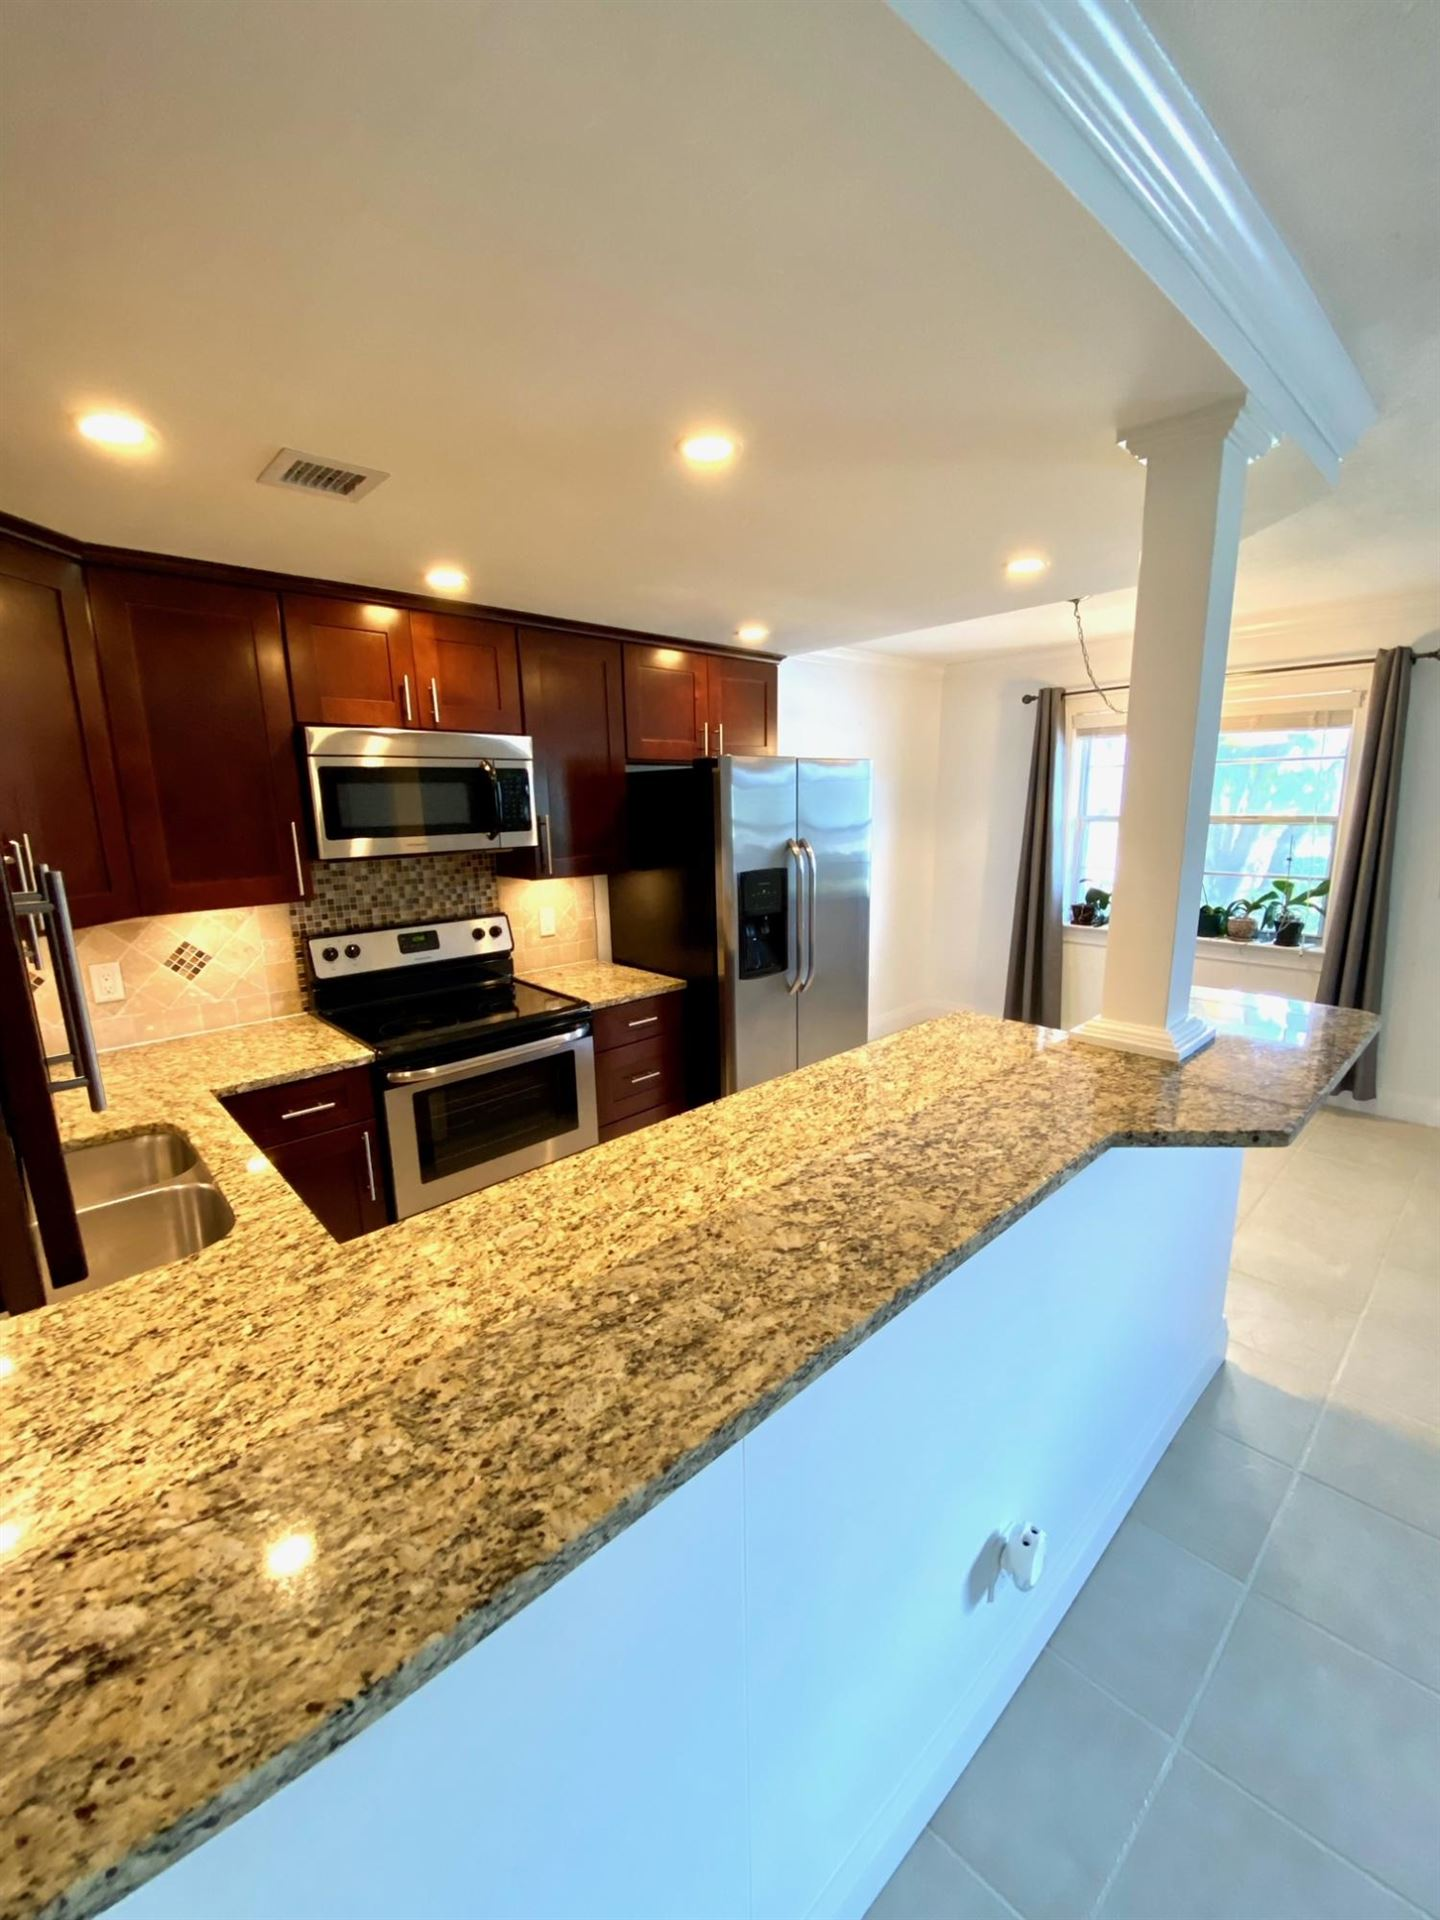 227 Castlewood Drive #106, North Palm Beach, FL 33408 - MLS#: RX-10739934